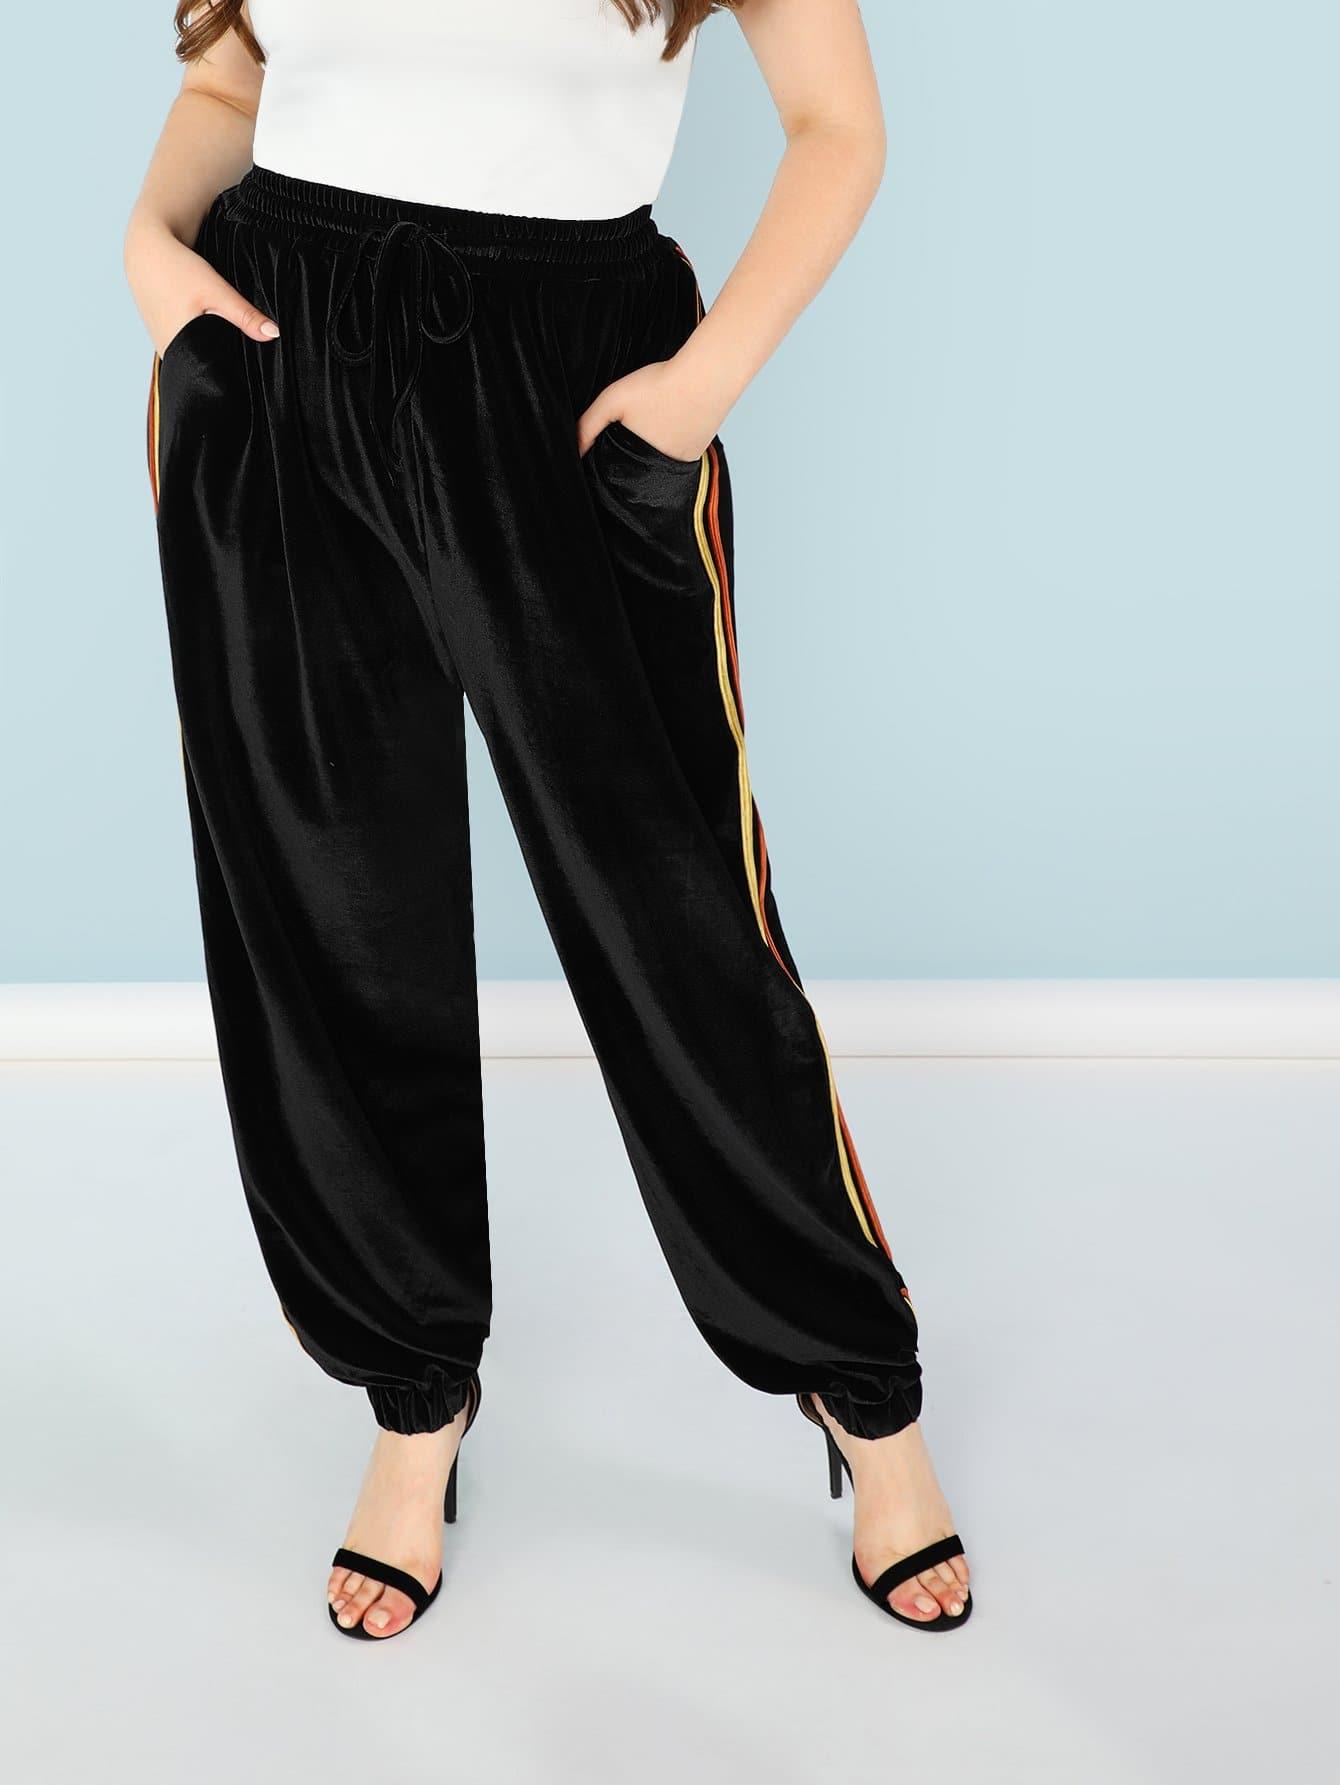 Plus Contrast Striped Side Drawstring Waist Sweatpants contrast striped side sweatpants